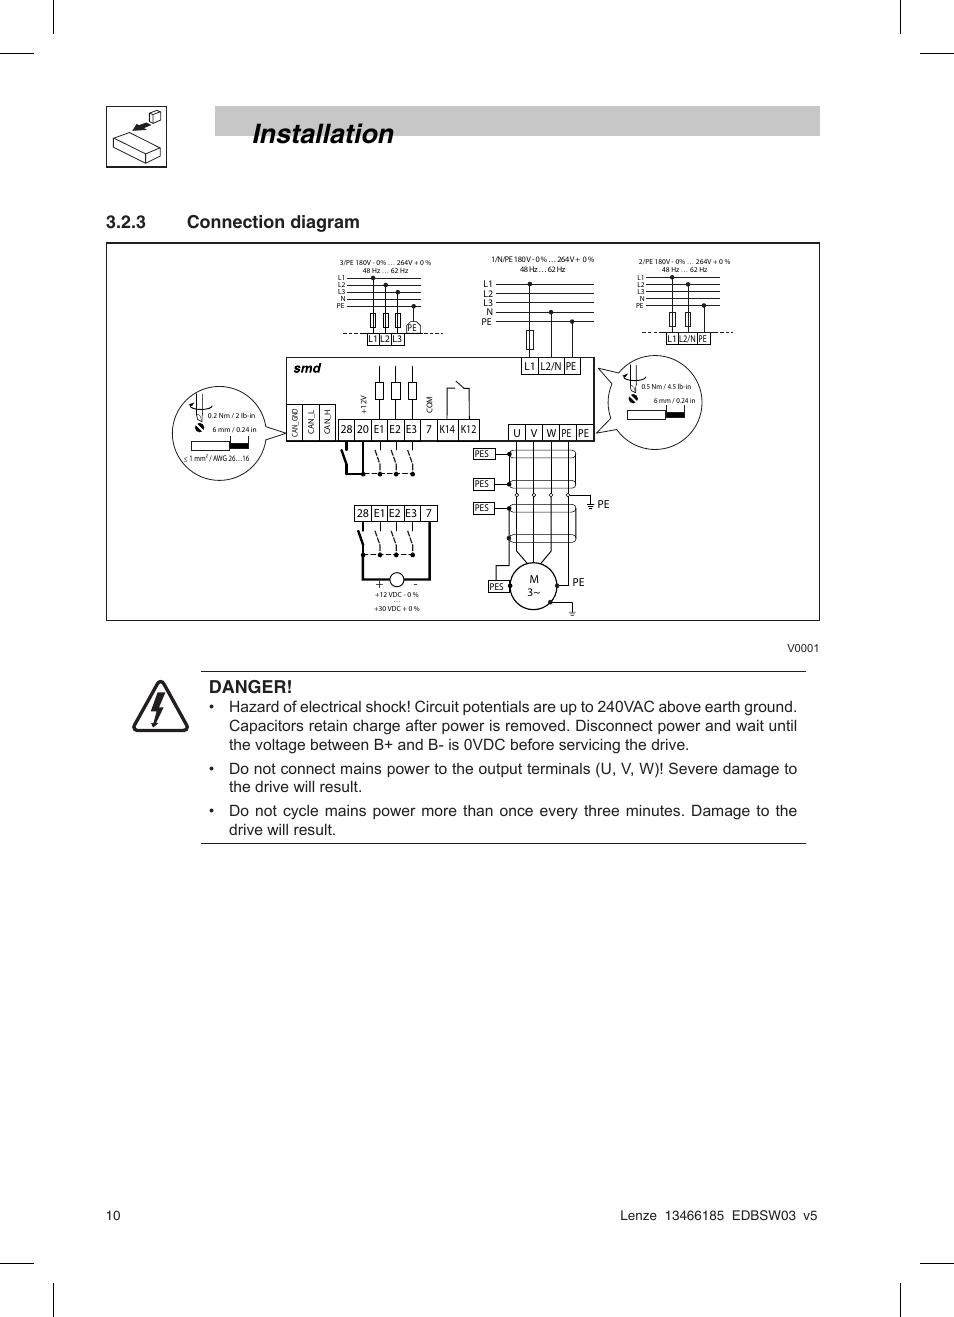 Lenze Inverter Wiring Diagram : Inverter ballast wiring diagram fluorescent fixtures t